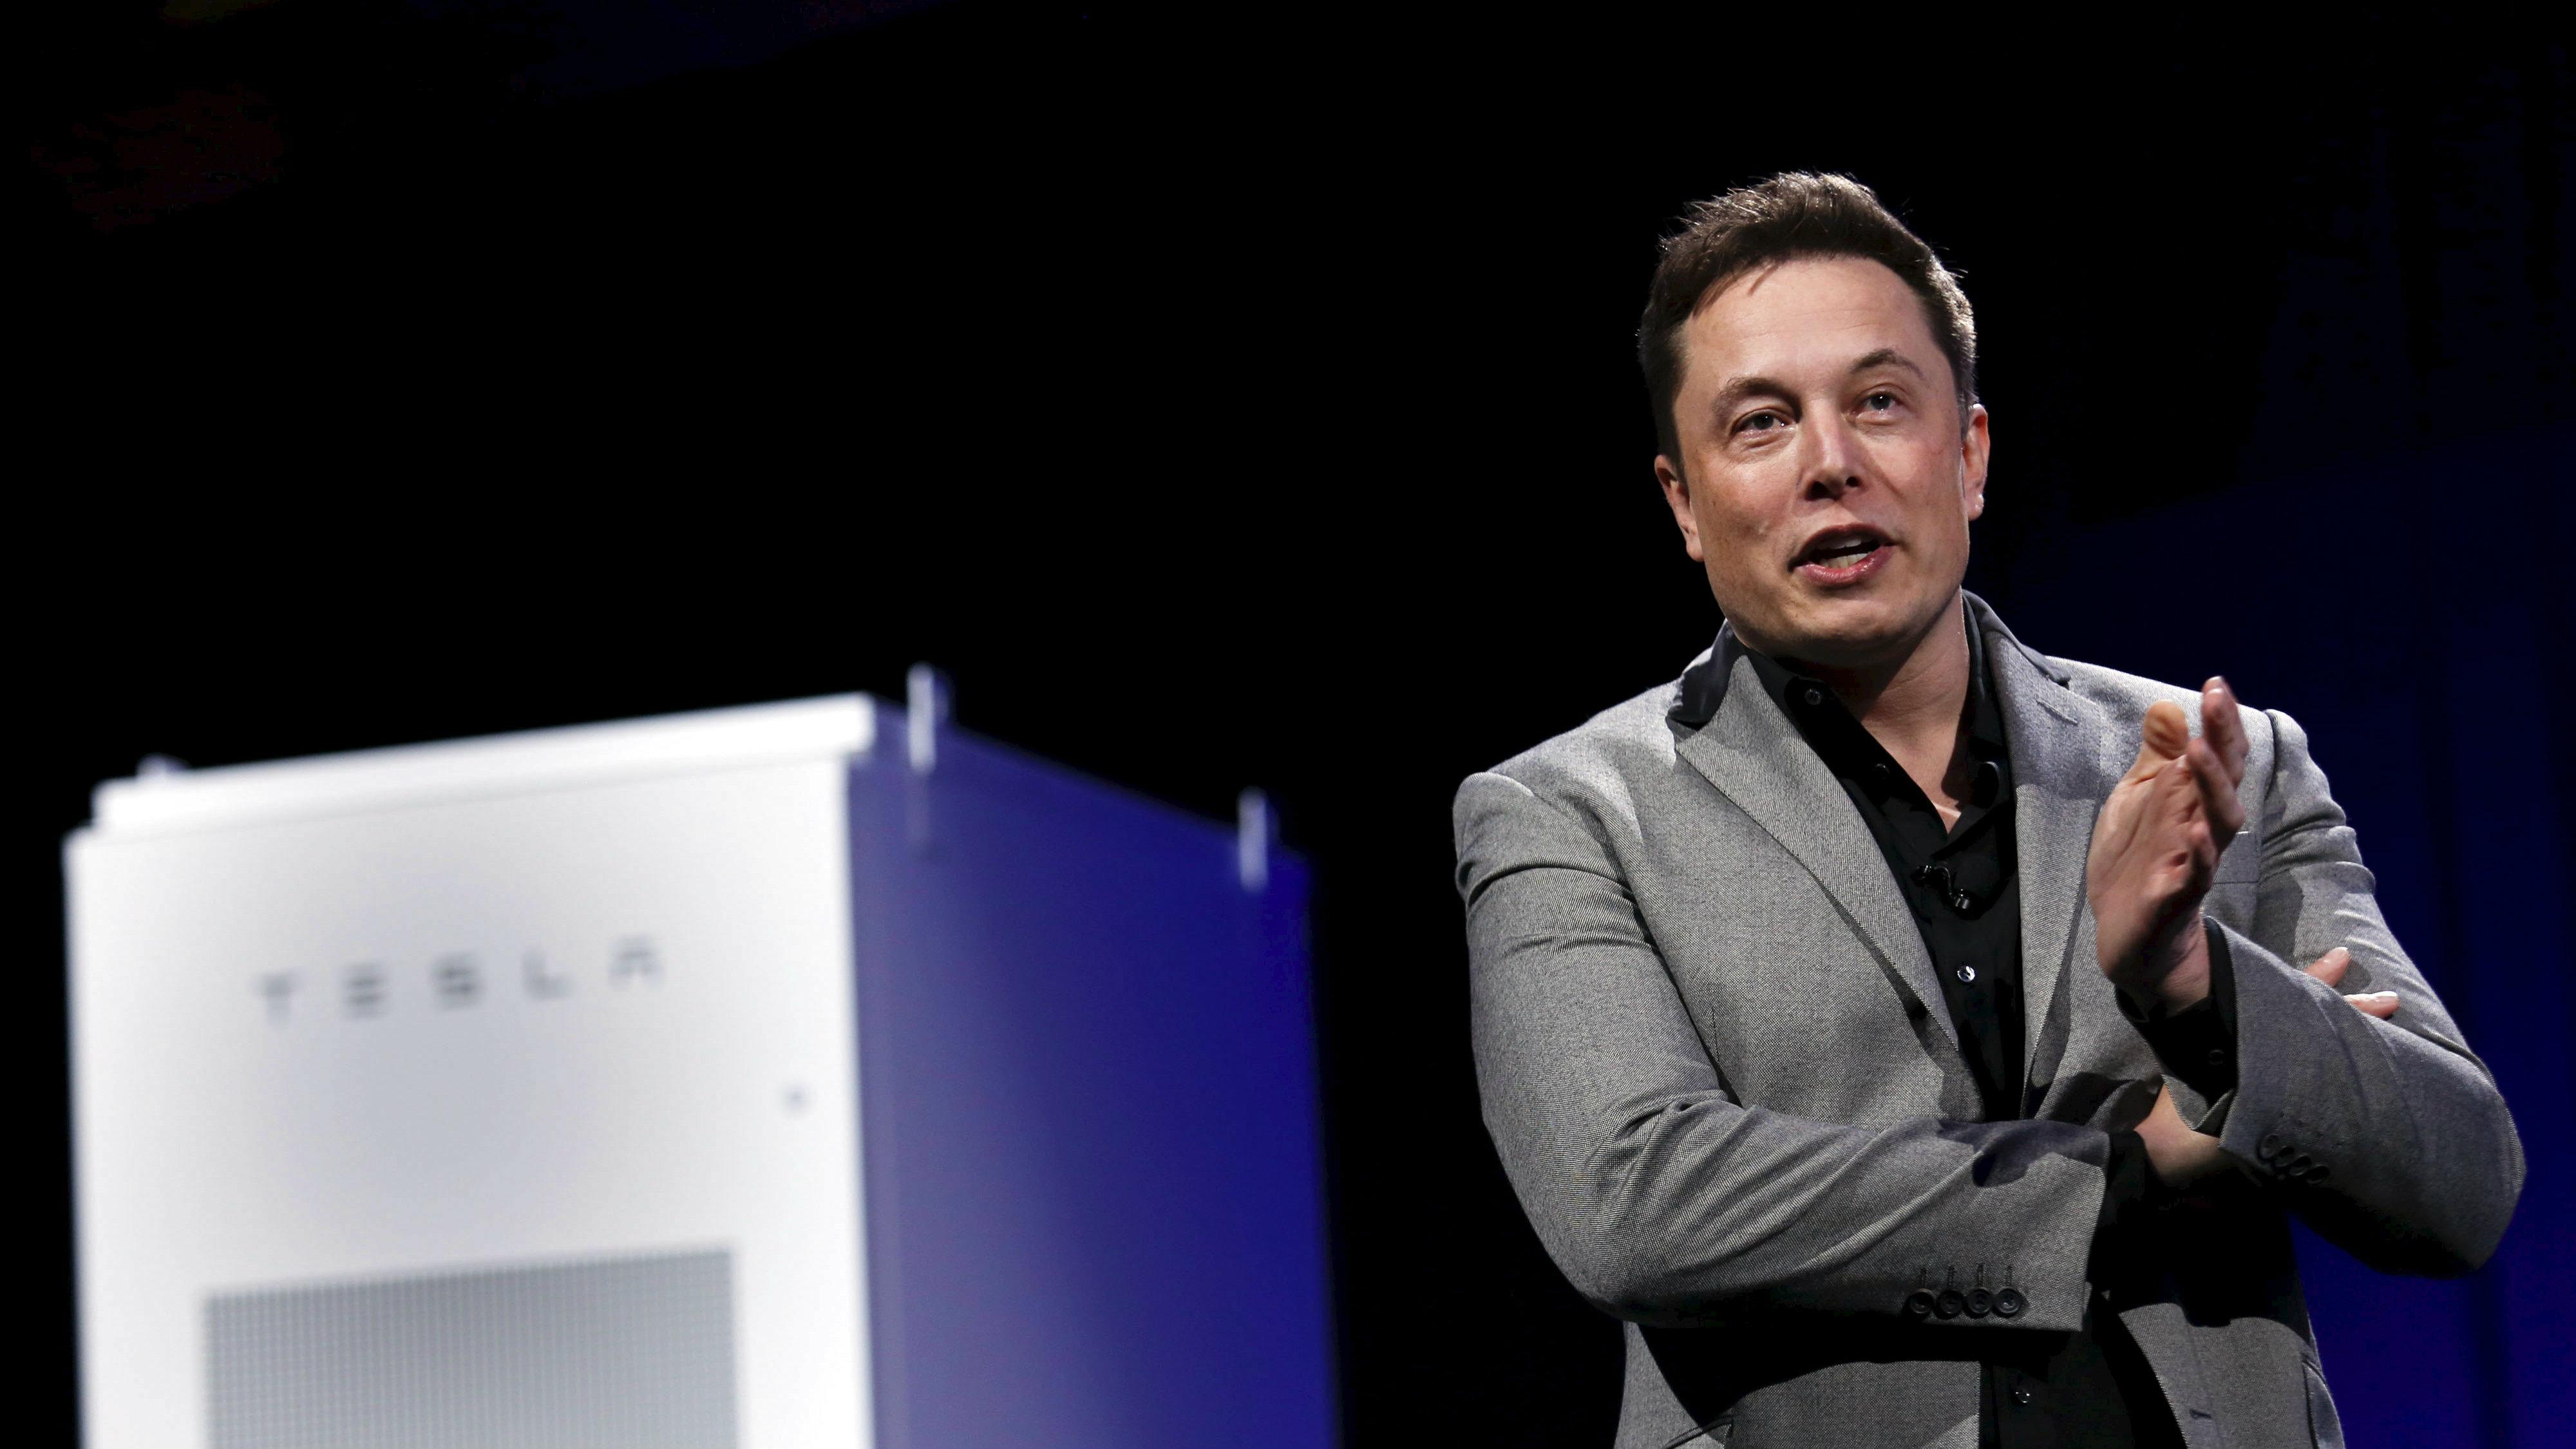 DATE IMPORTED:May 01, 2015Tesla Motors CEO Elon Musk